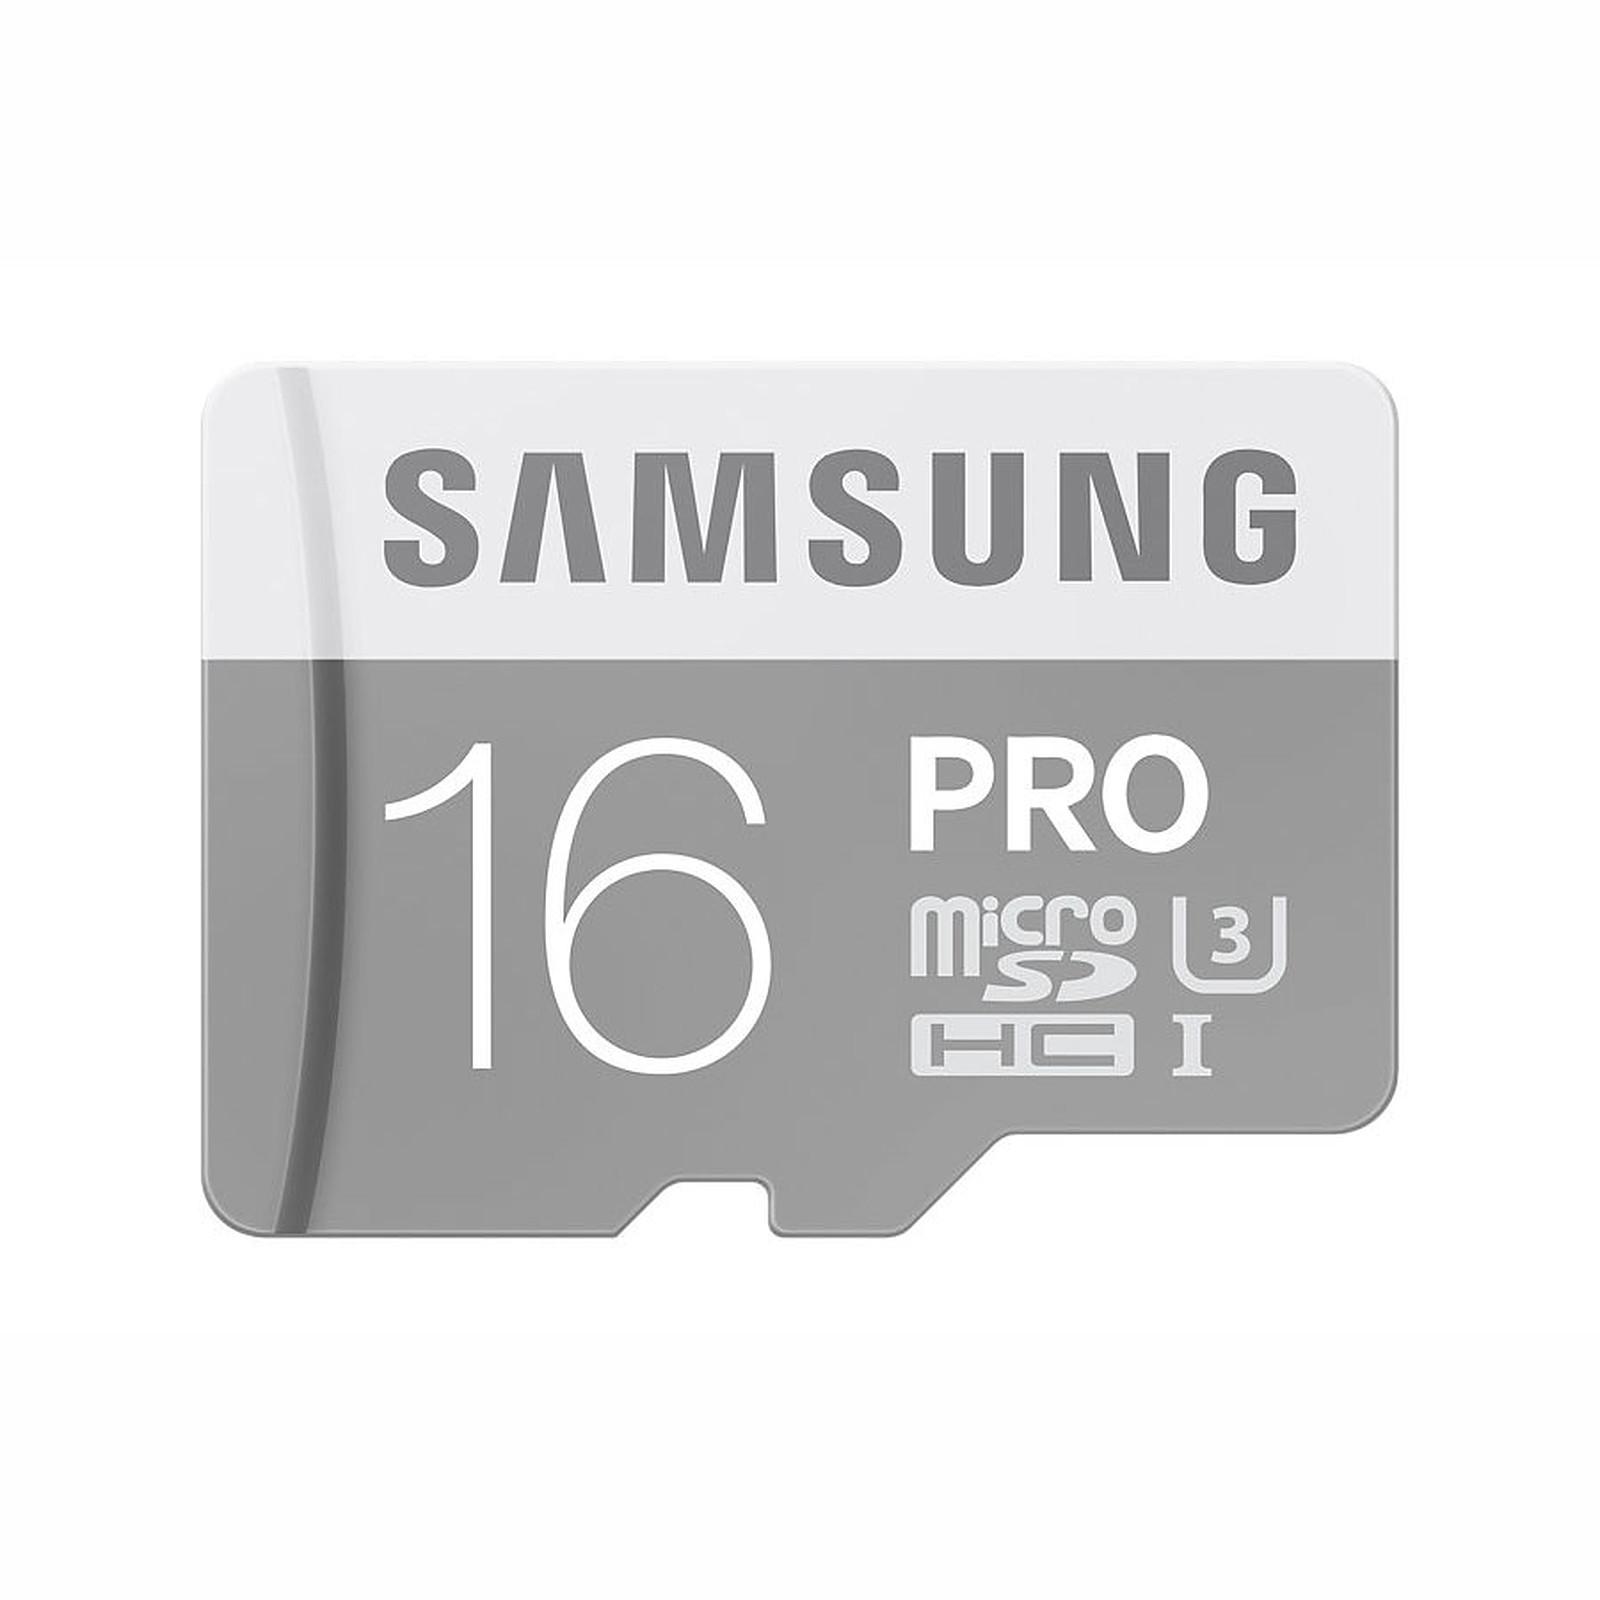 Samsung Pro U3 microSDHC 16 Go